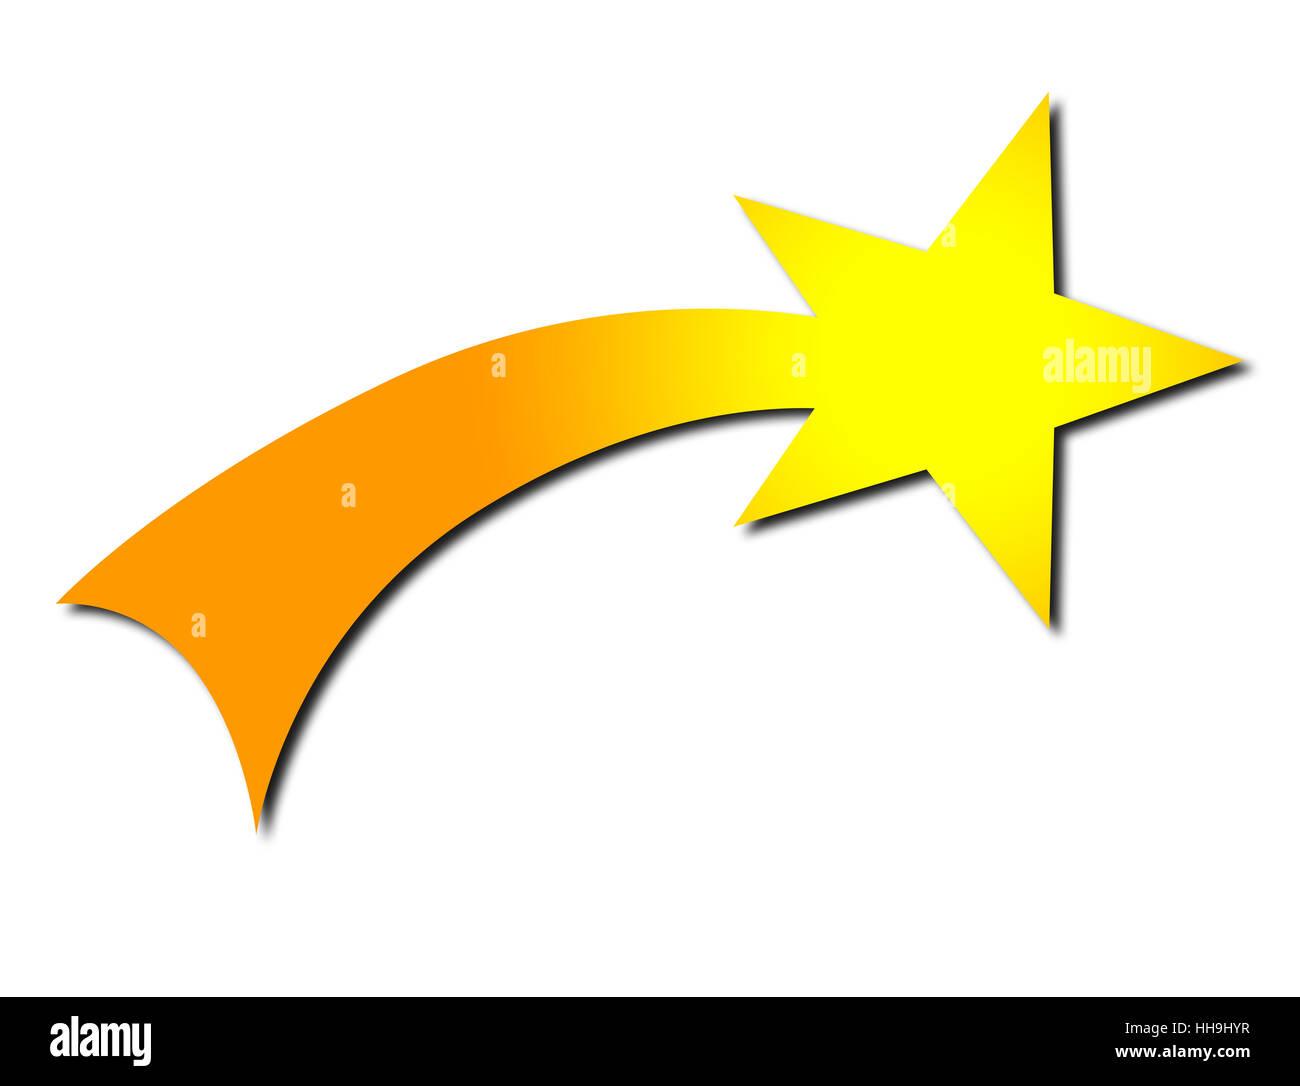 Sign Signal Shooting Star Star Poinsettia Pictogram Symbol